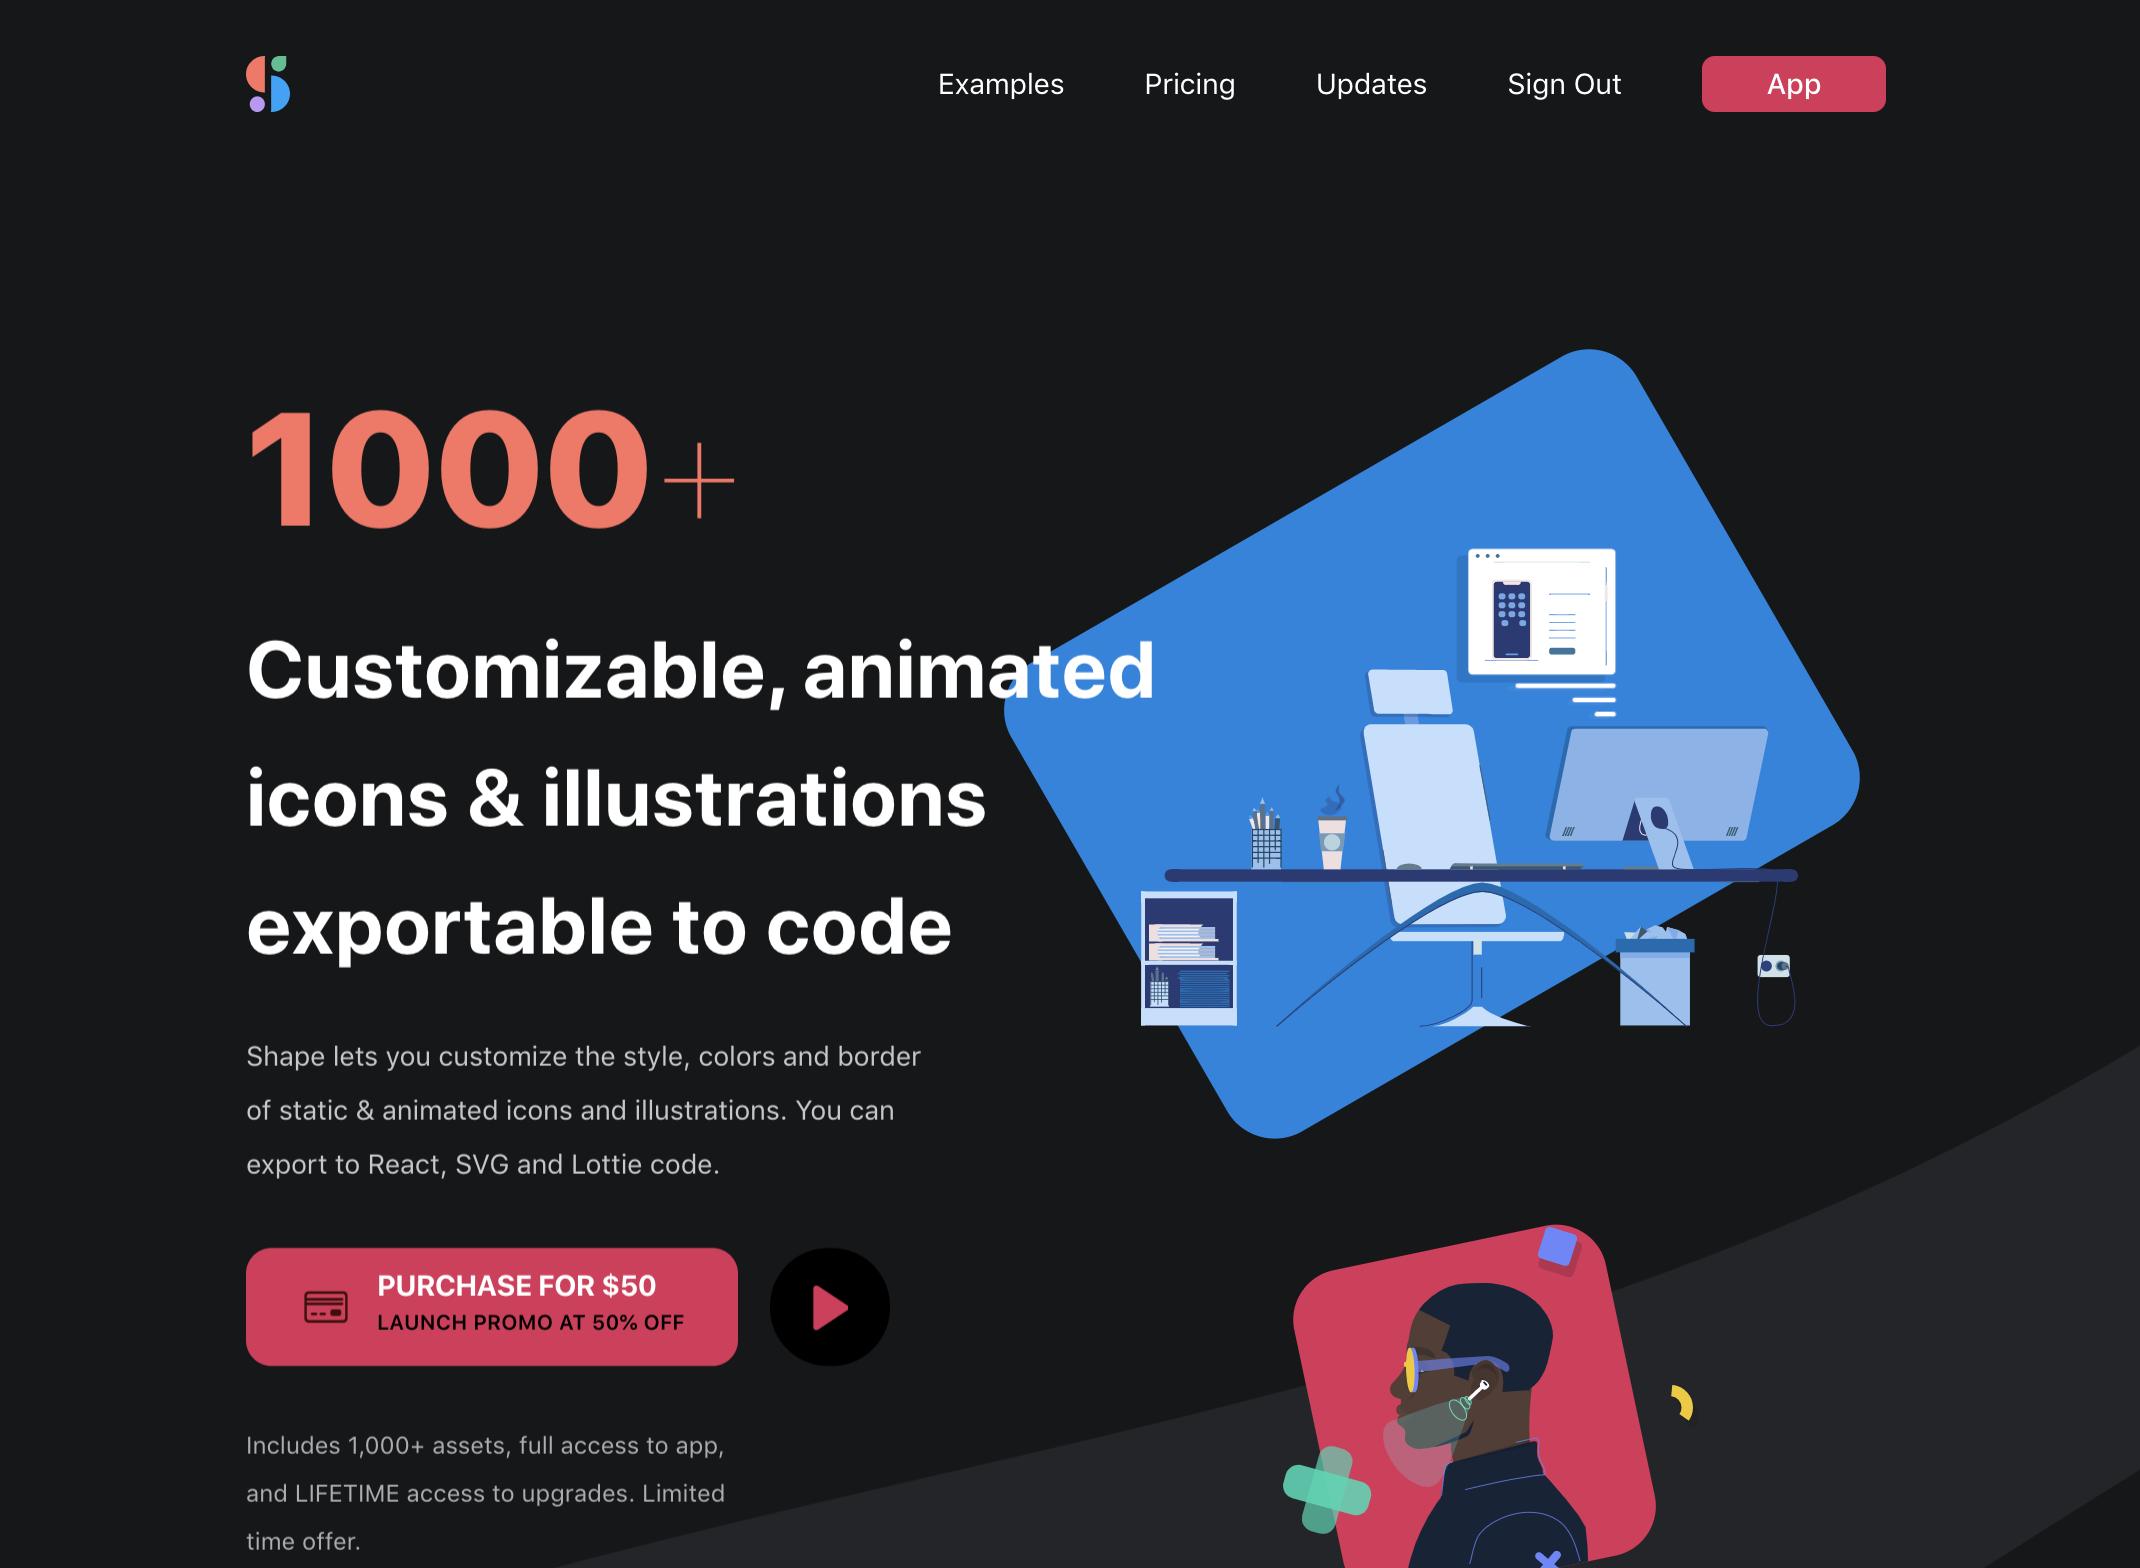 1000+ Customizable, Animated Icons & Illustrations. You